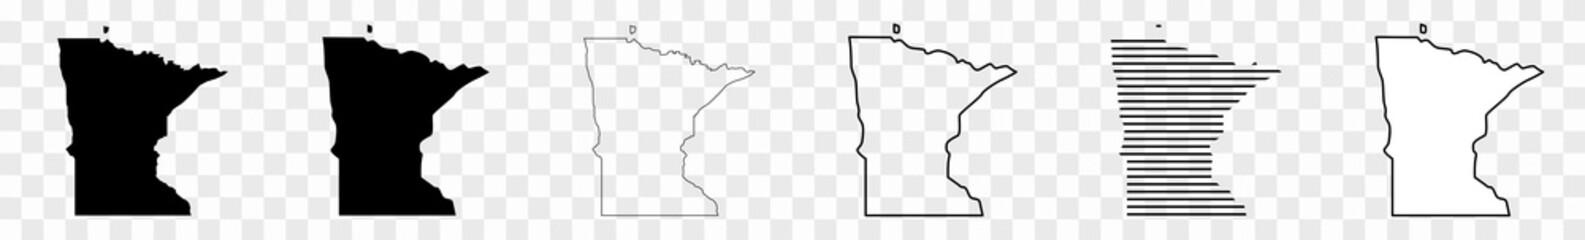 Minnesota Map Black | State Border | United States | US America | Transparent Isolated | Variations